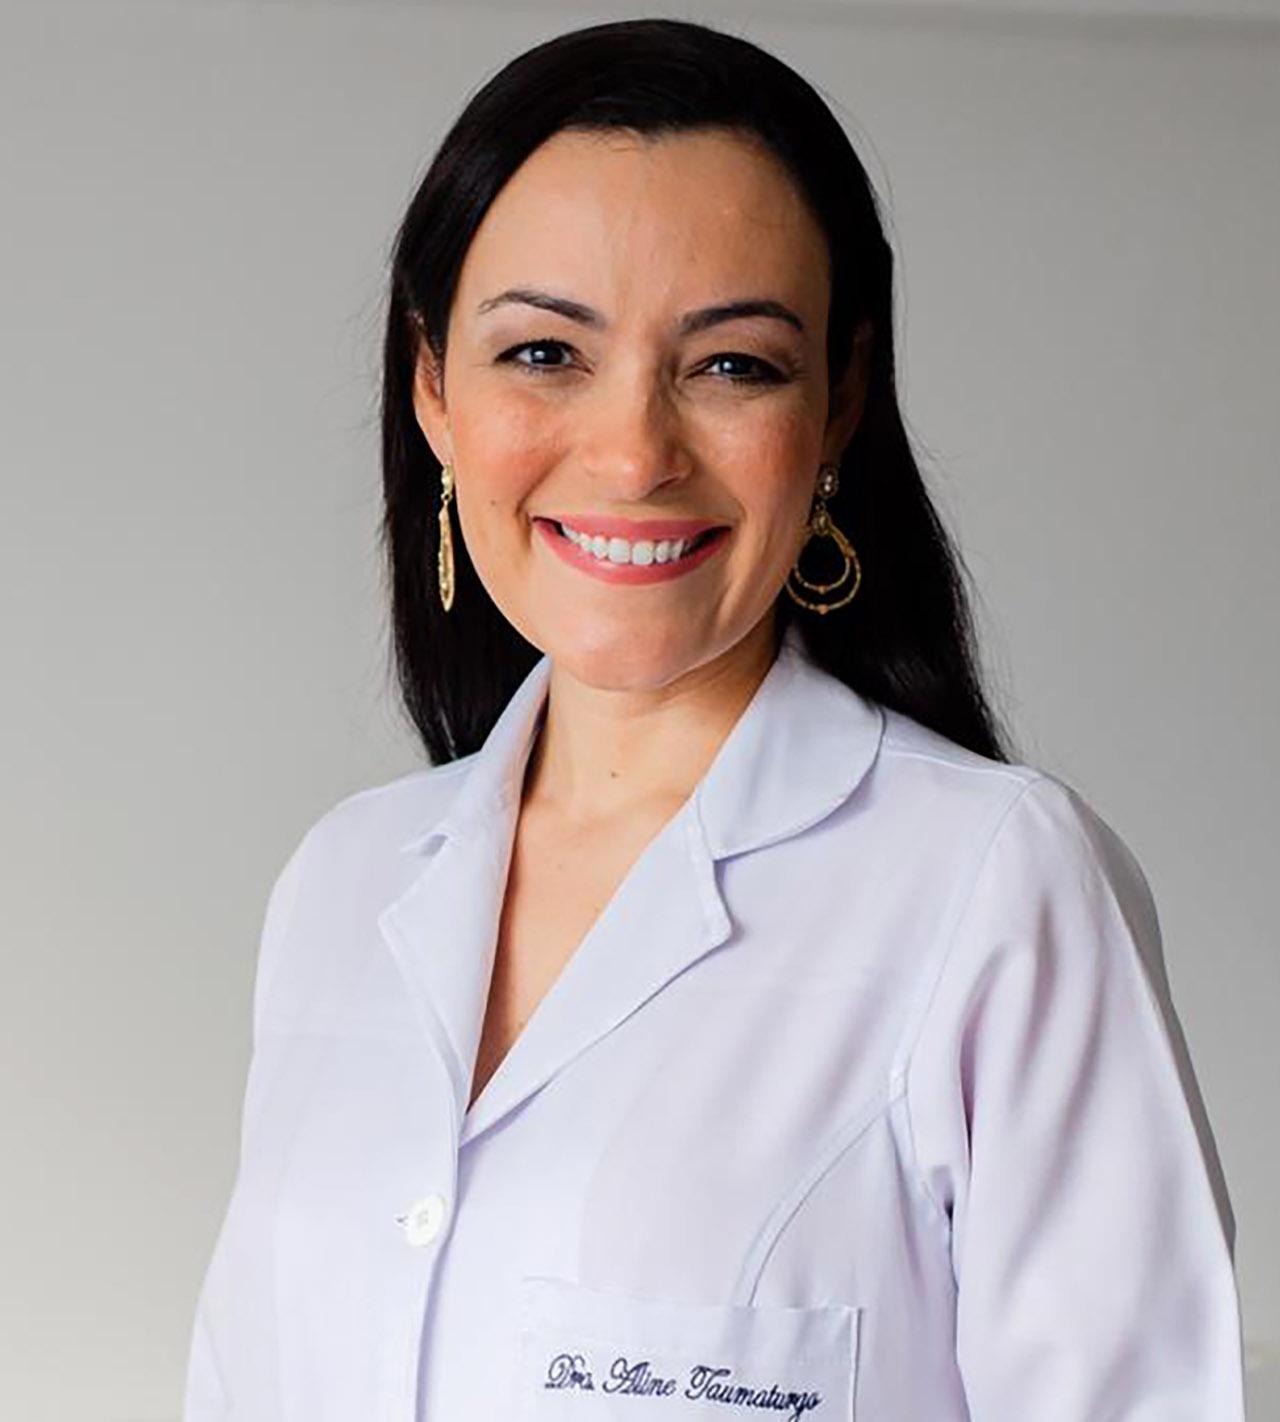 Aline Taumaturgo